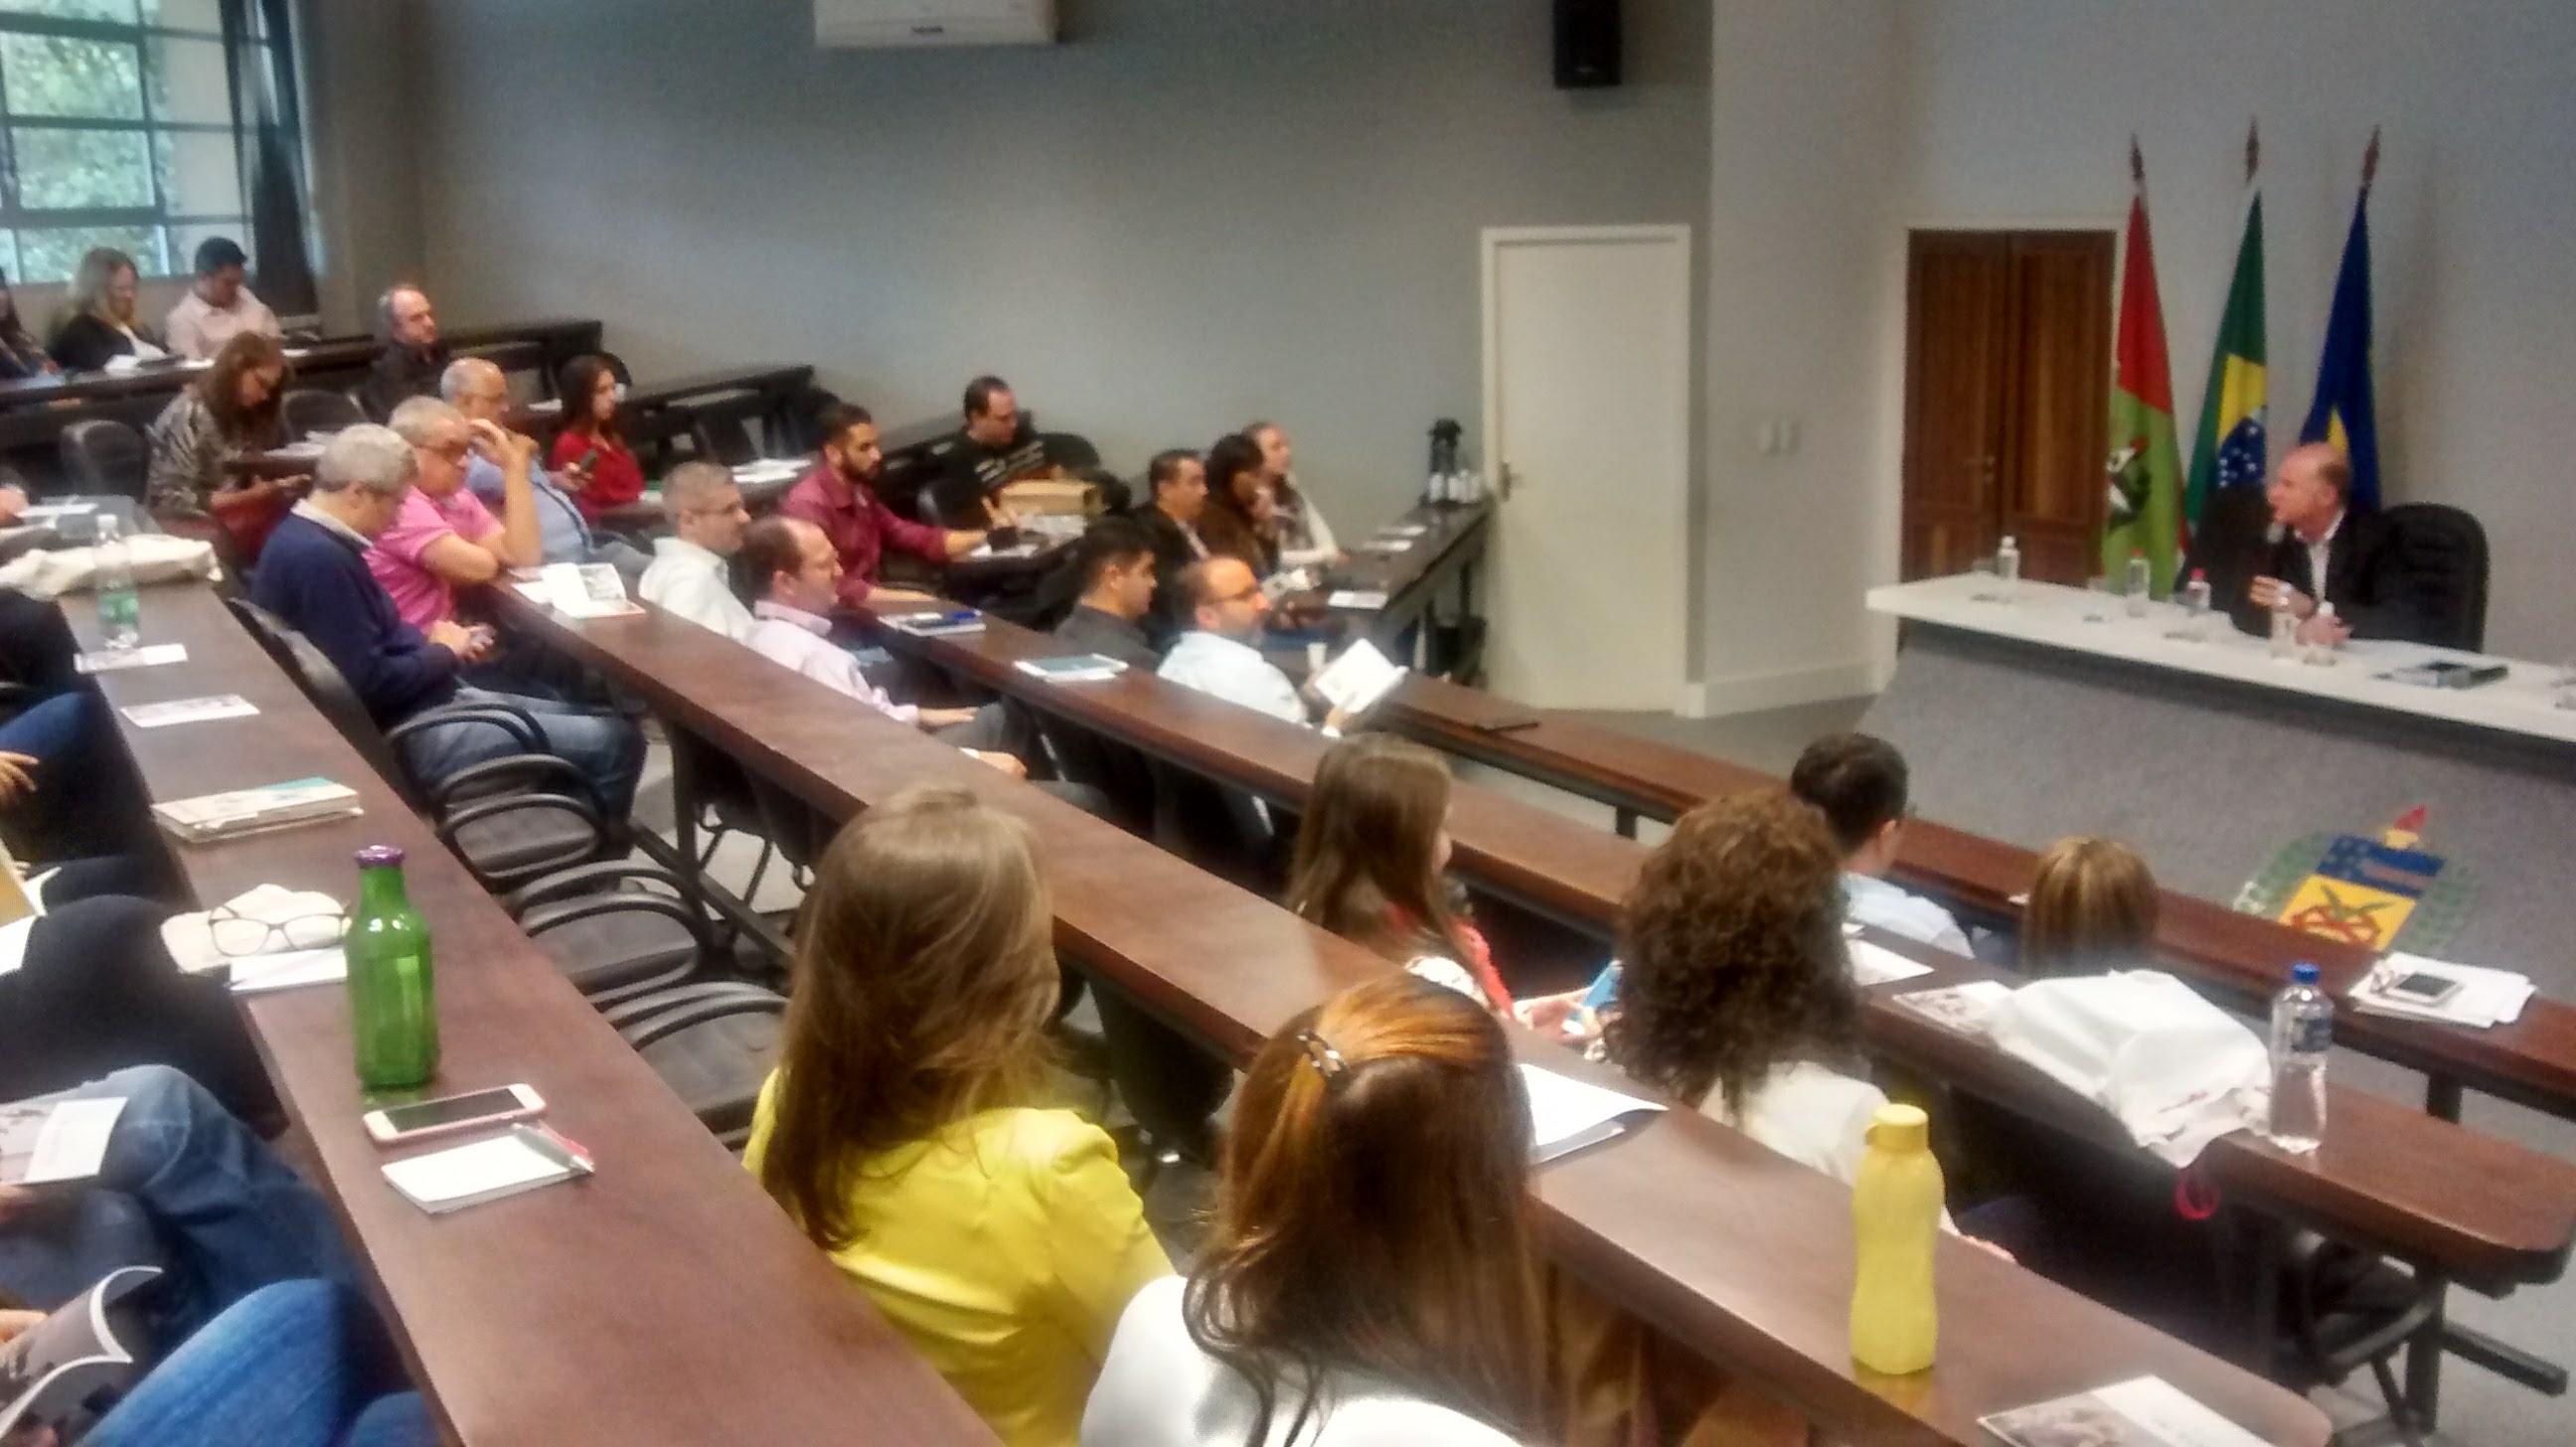 Palestra ministrada por Gildo Volpato, Reitor da Universidade do Extremo Sul Catarinense – UNESC